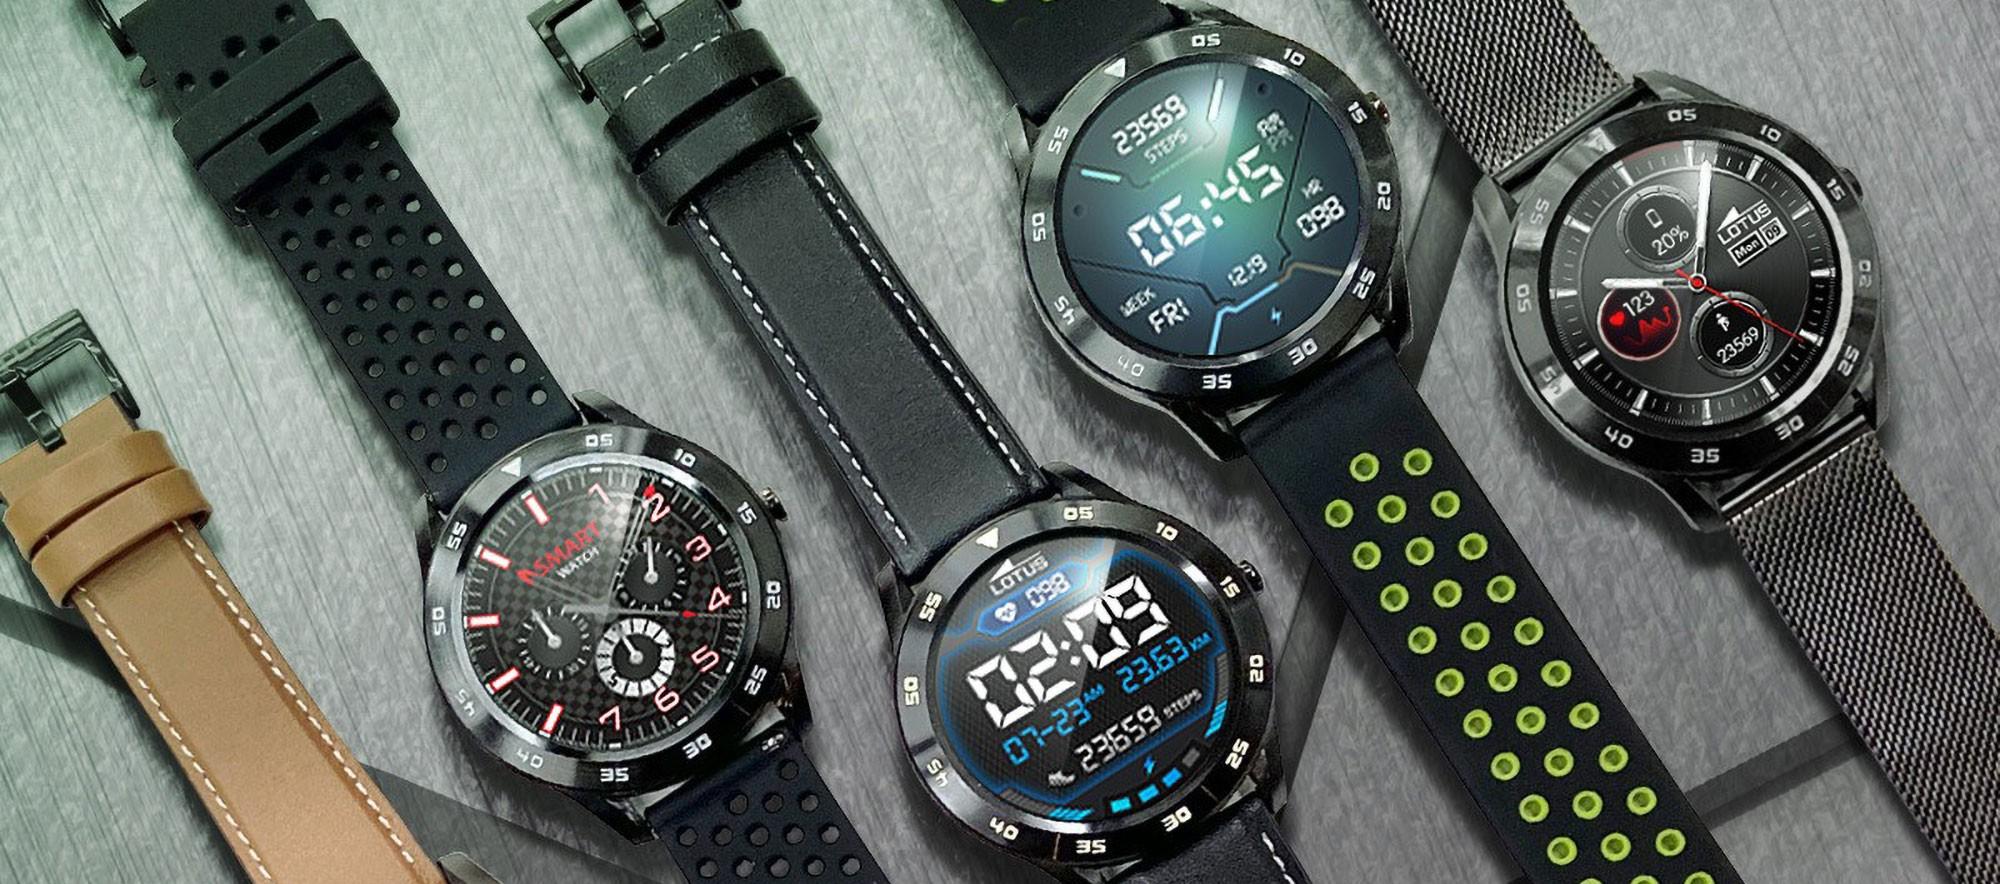 Smartwatch Lotus